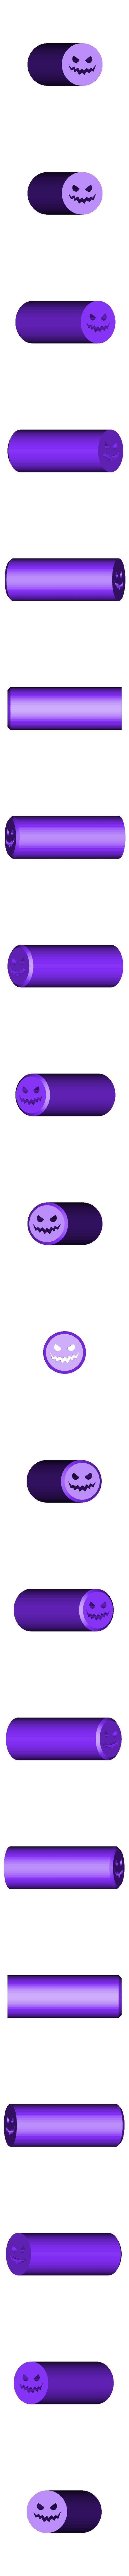 Filtro  halloween face 1 v1.stl Download STL file FILTER TIPS - 89 FILTERS- ALL PACKS - WEED FILTER • 3D printer model, Weed420House